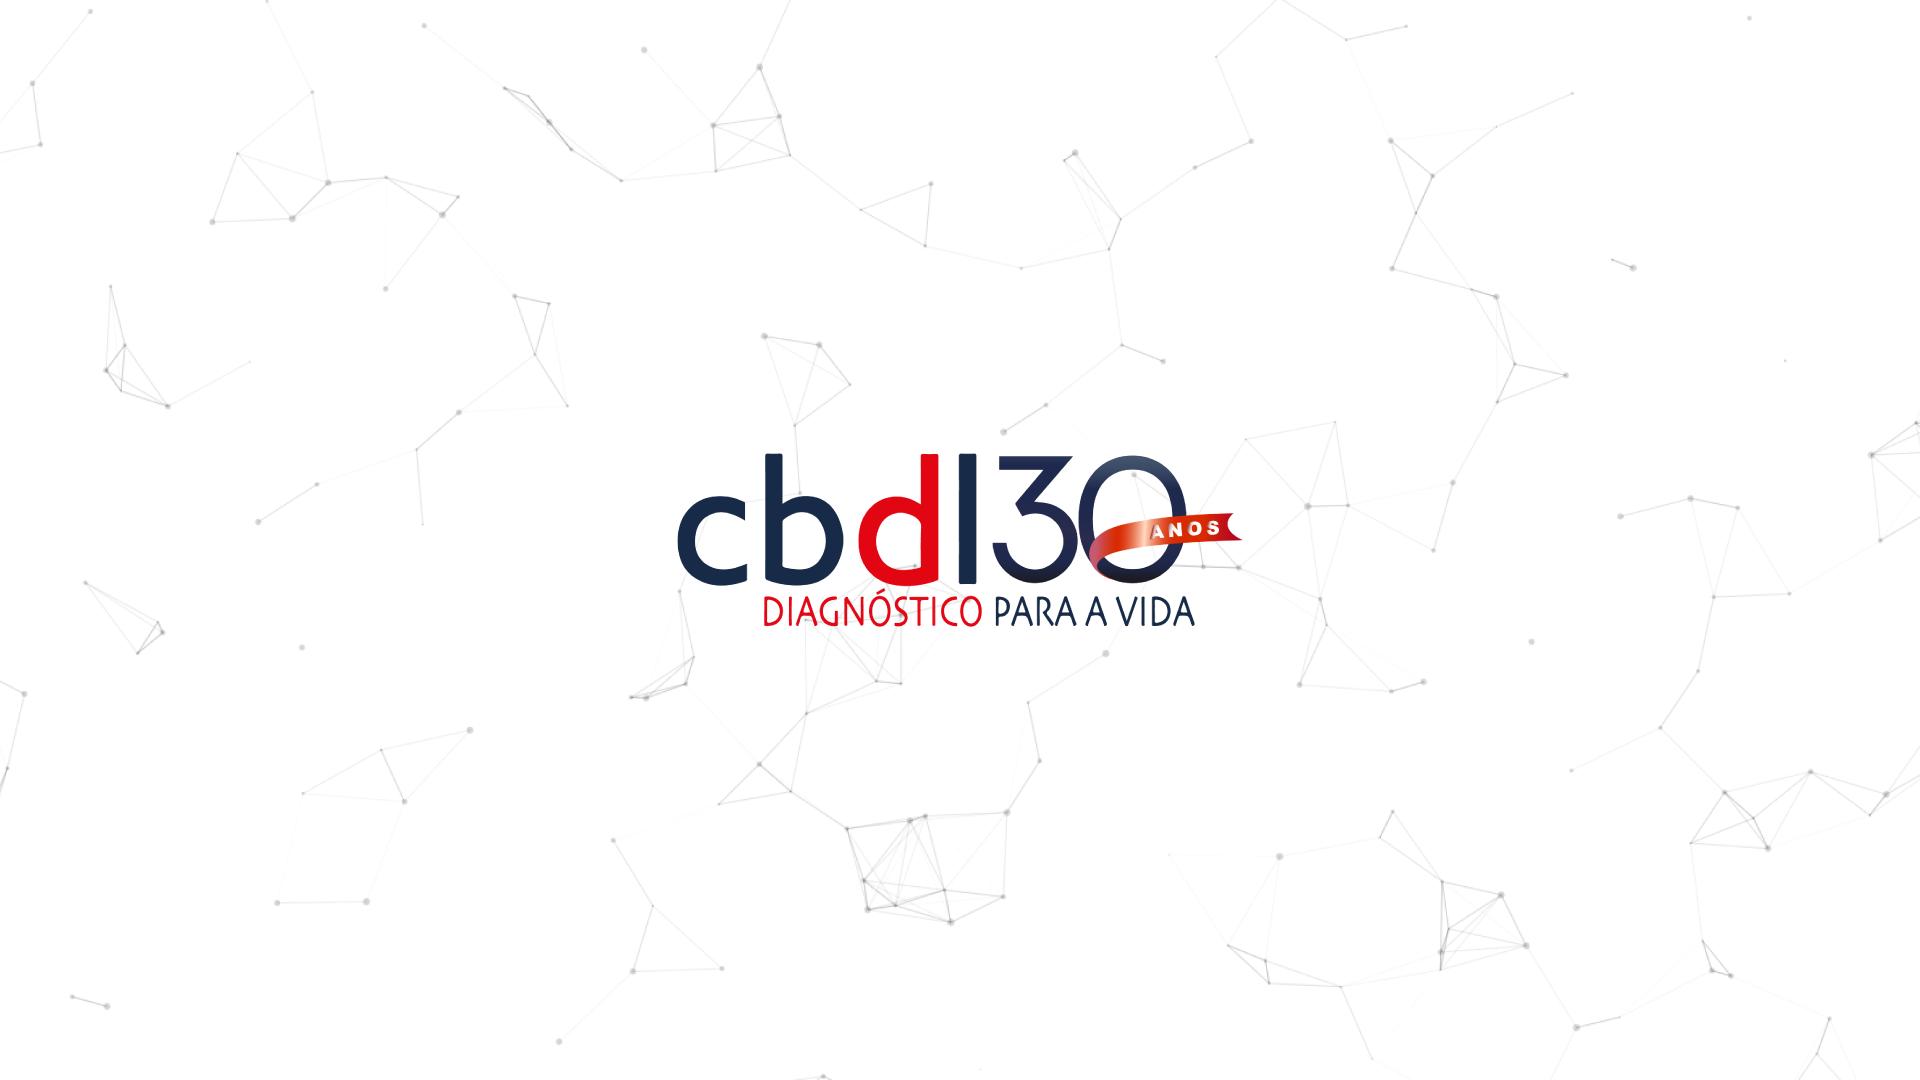 CBDL 30 Anos